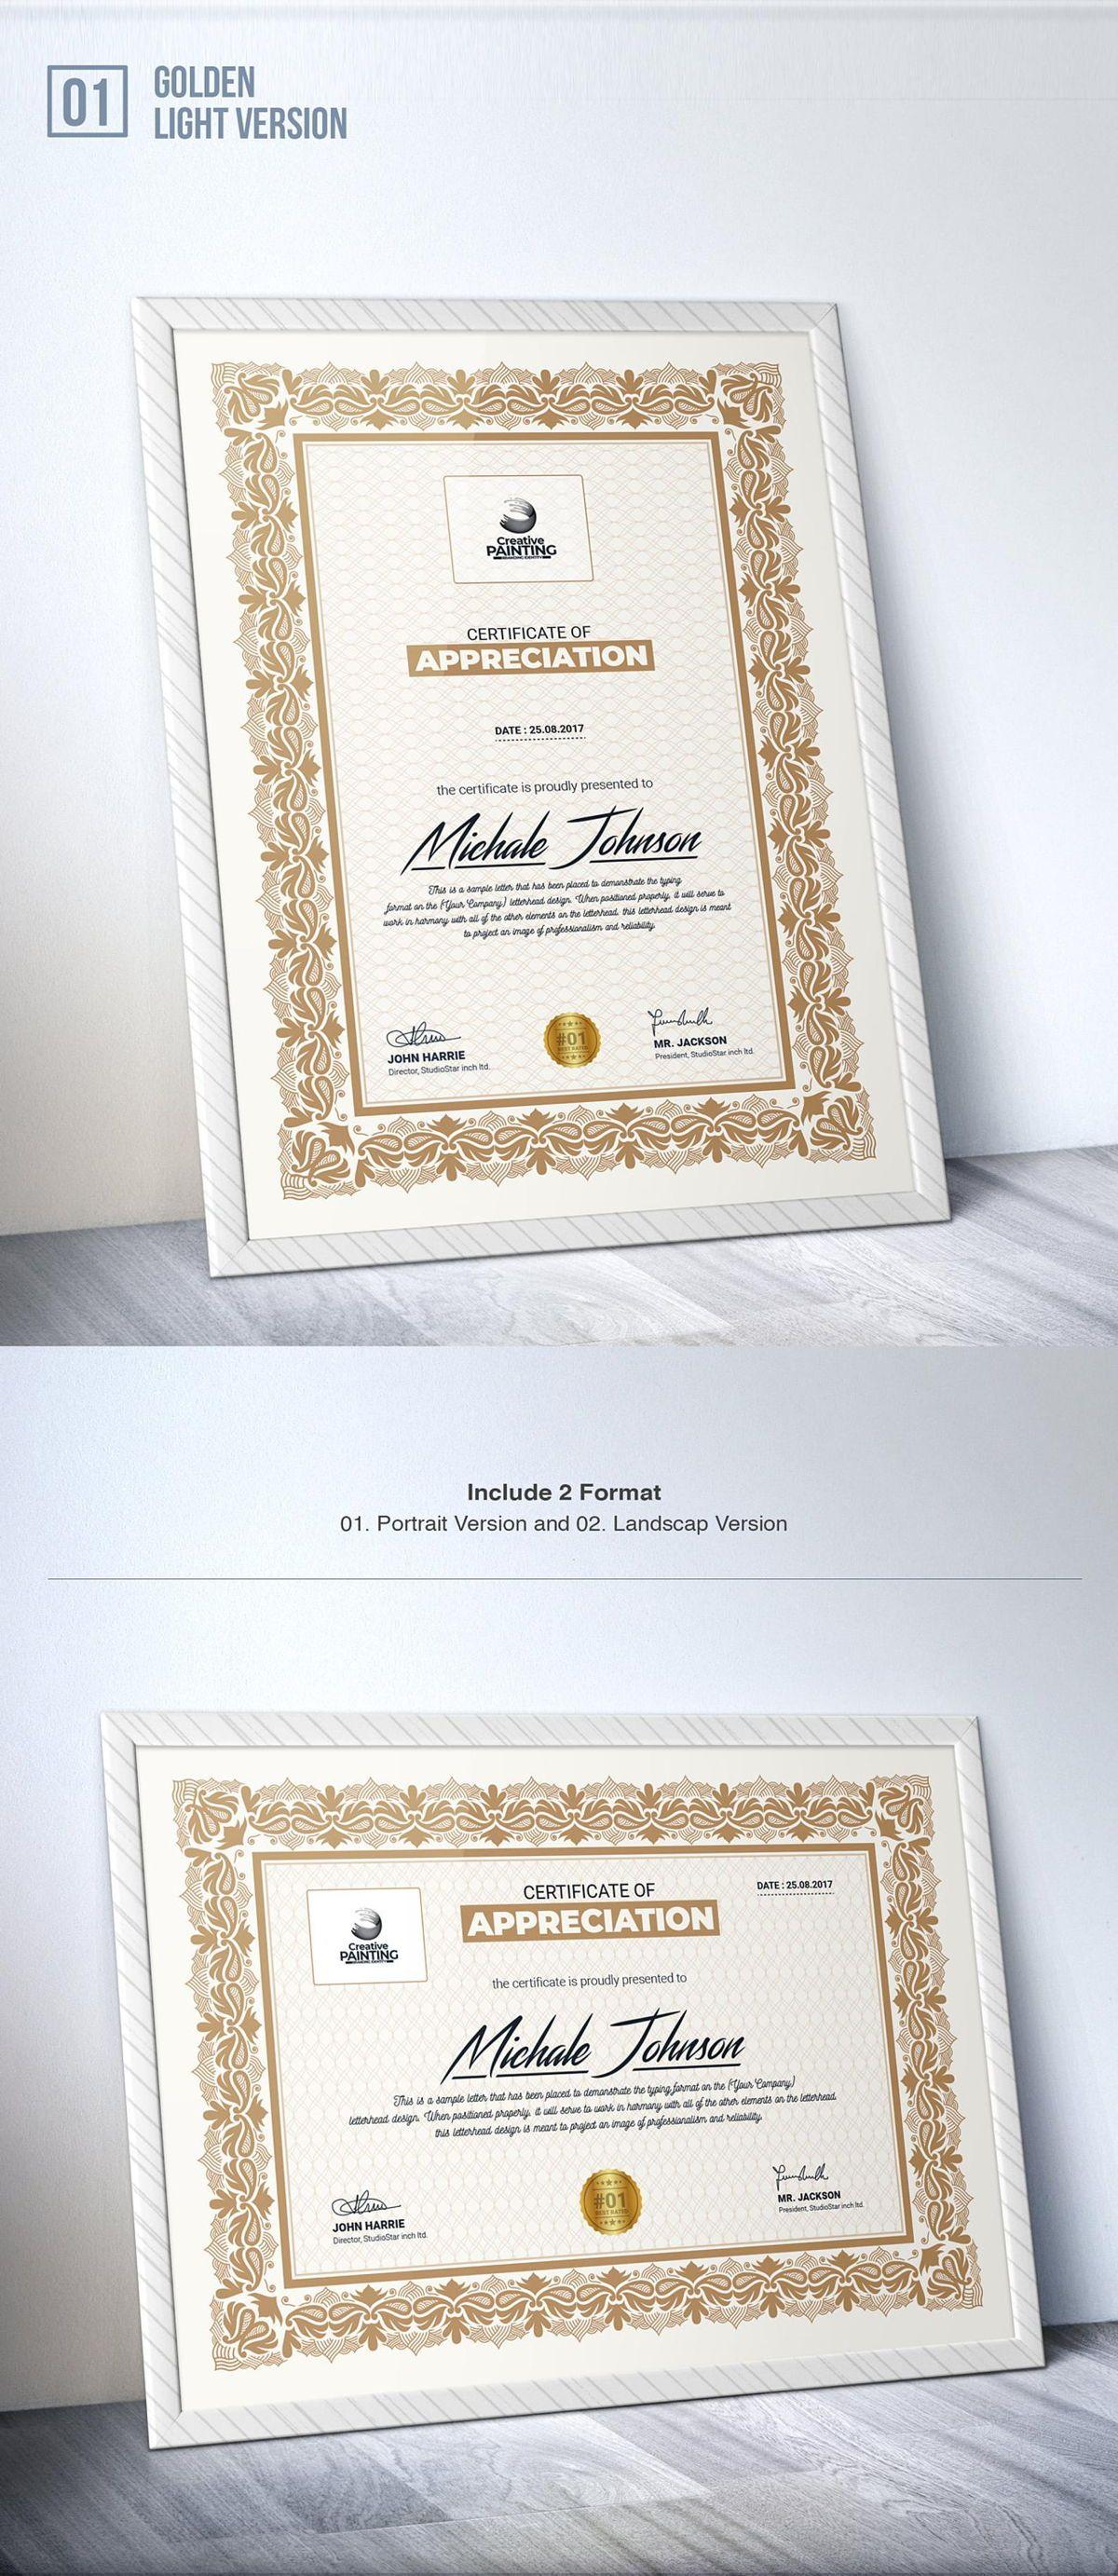 Creative Painting Certificate - 8 Colors - Dark and Light Version, Slide 3, 08755, Business — PoweredTemplate.com